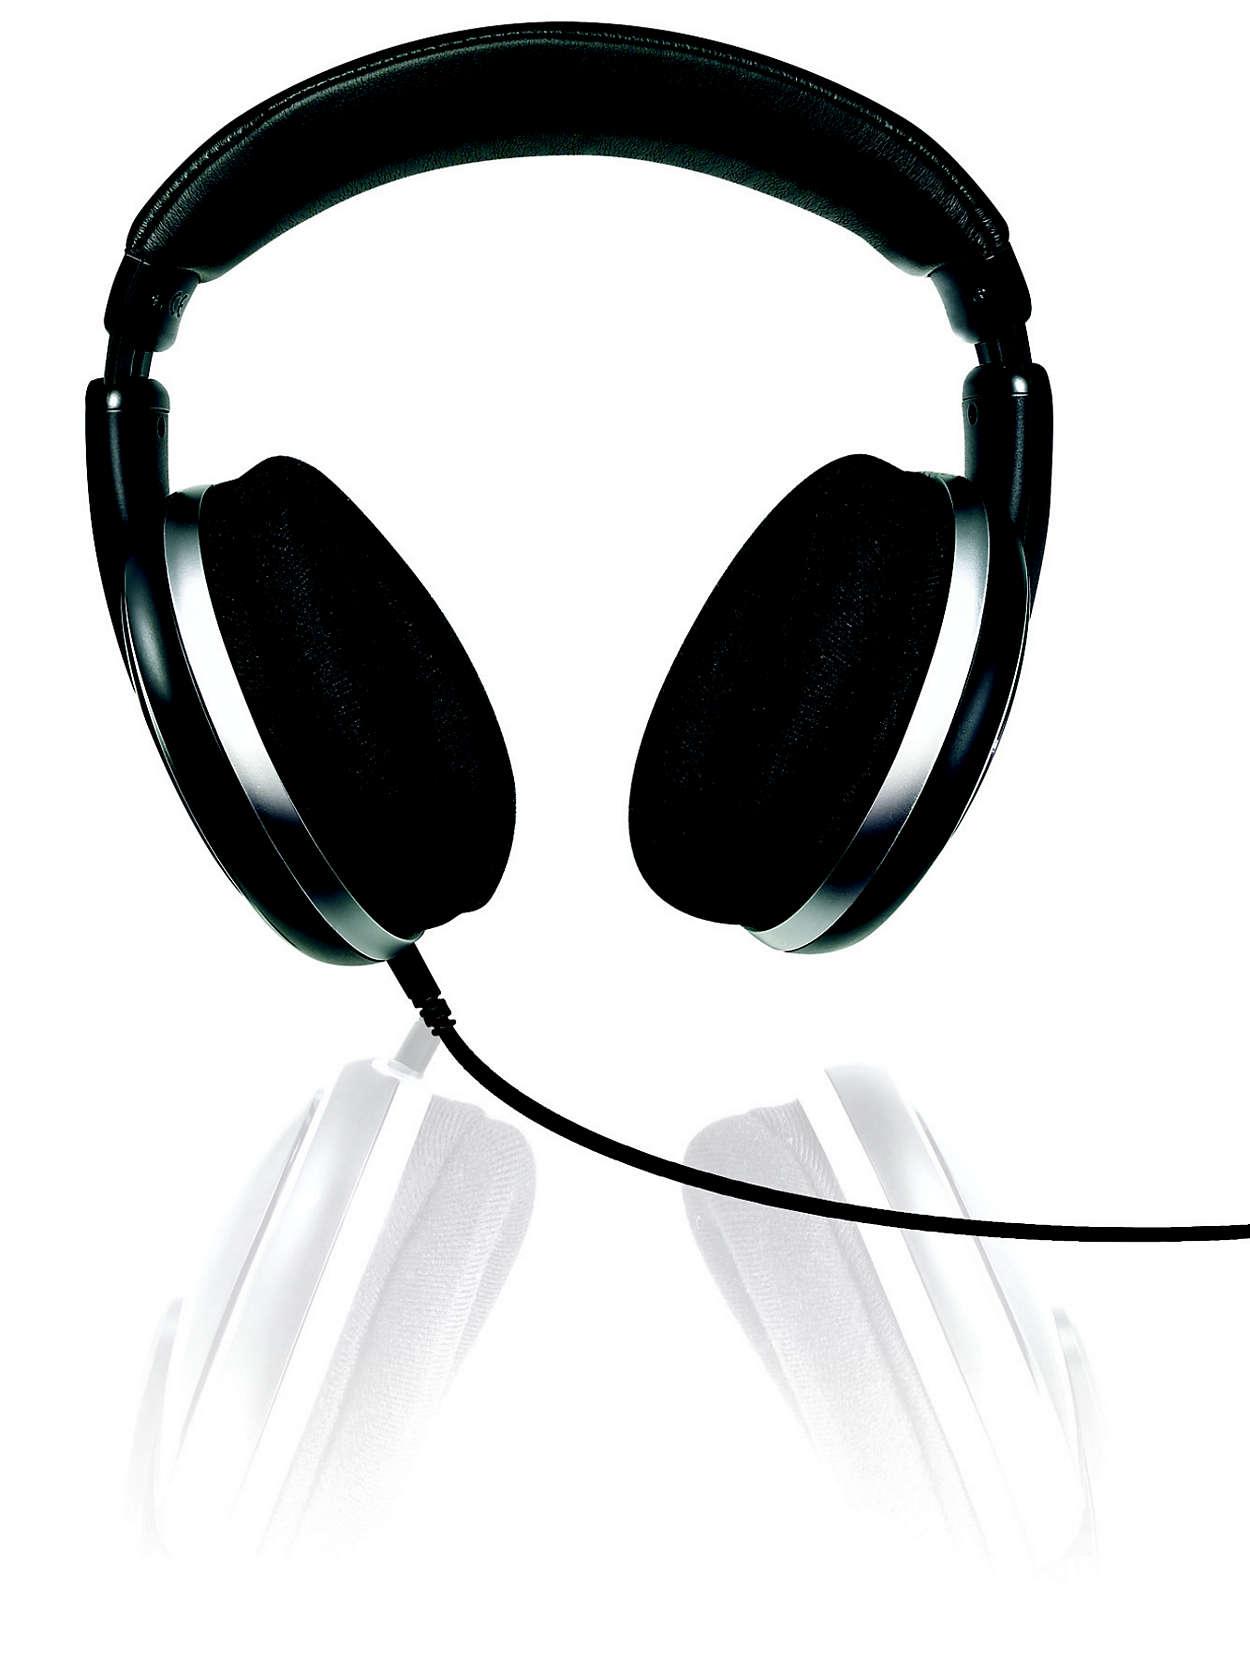 Dynamic hi-fi sound performance